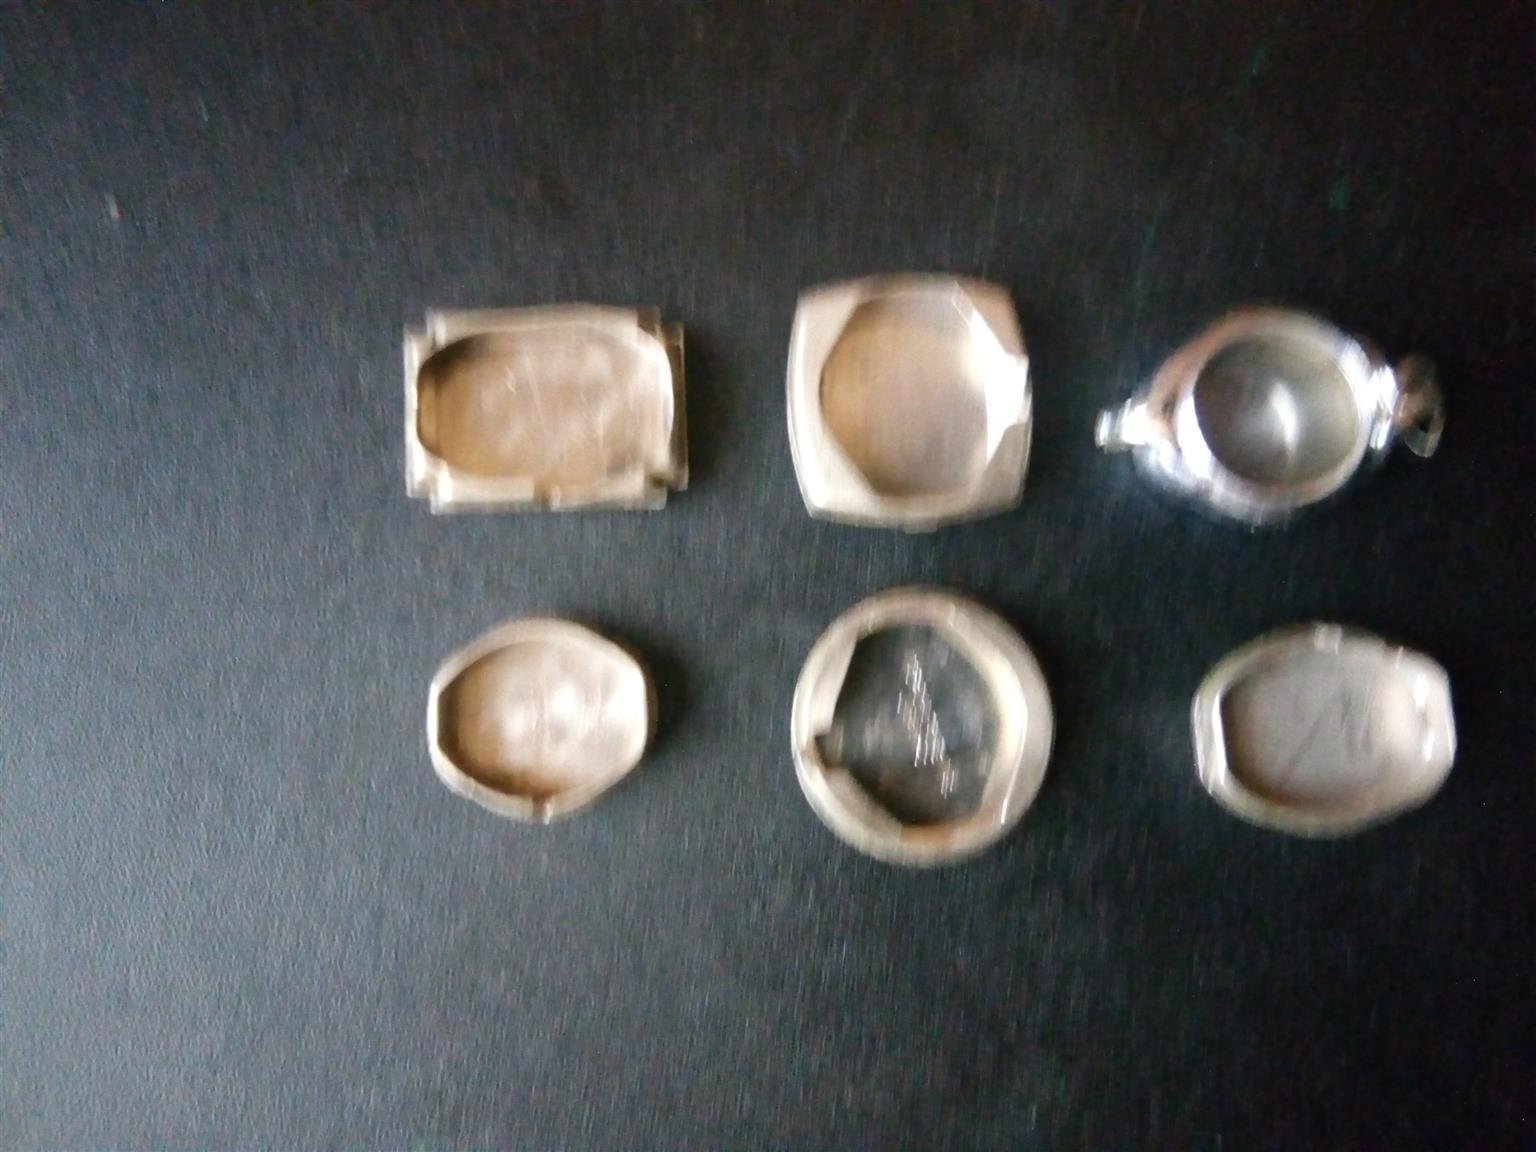 old swiss made 17 jewel watces